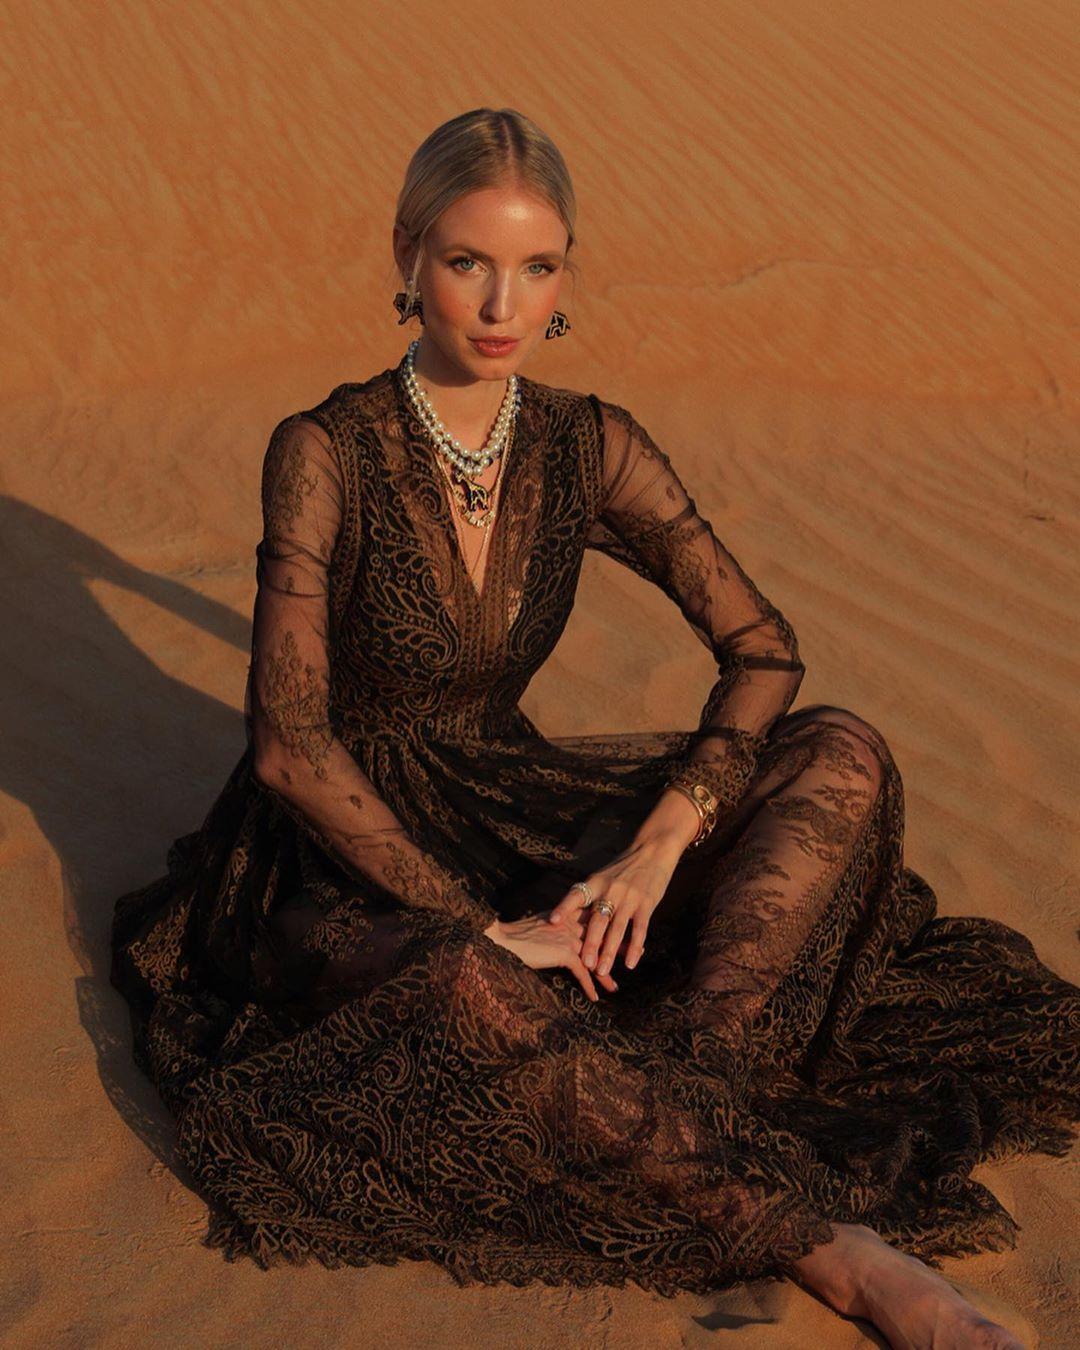 Leonie Hanne Desert Dubai